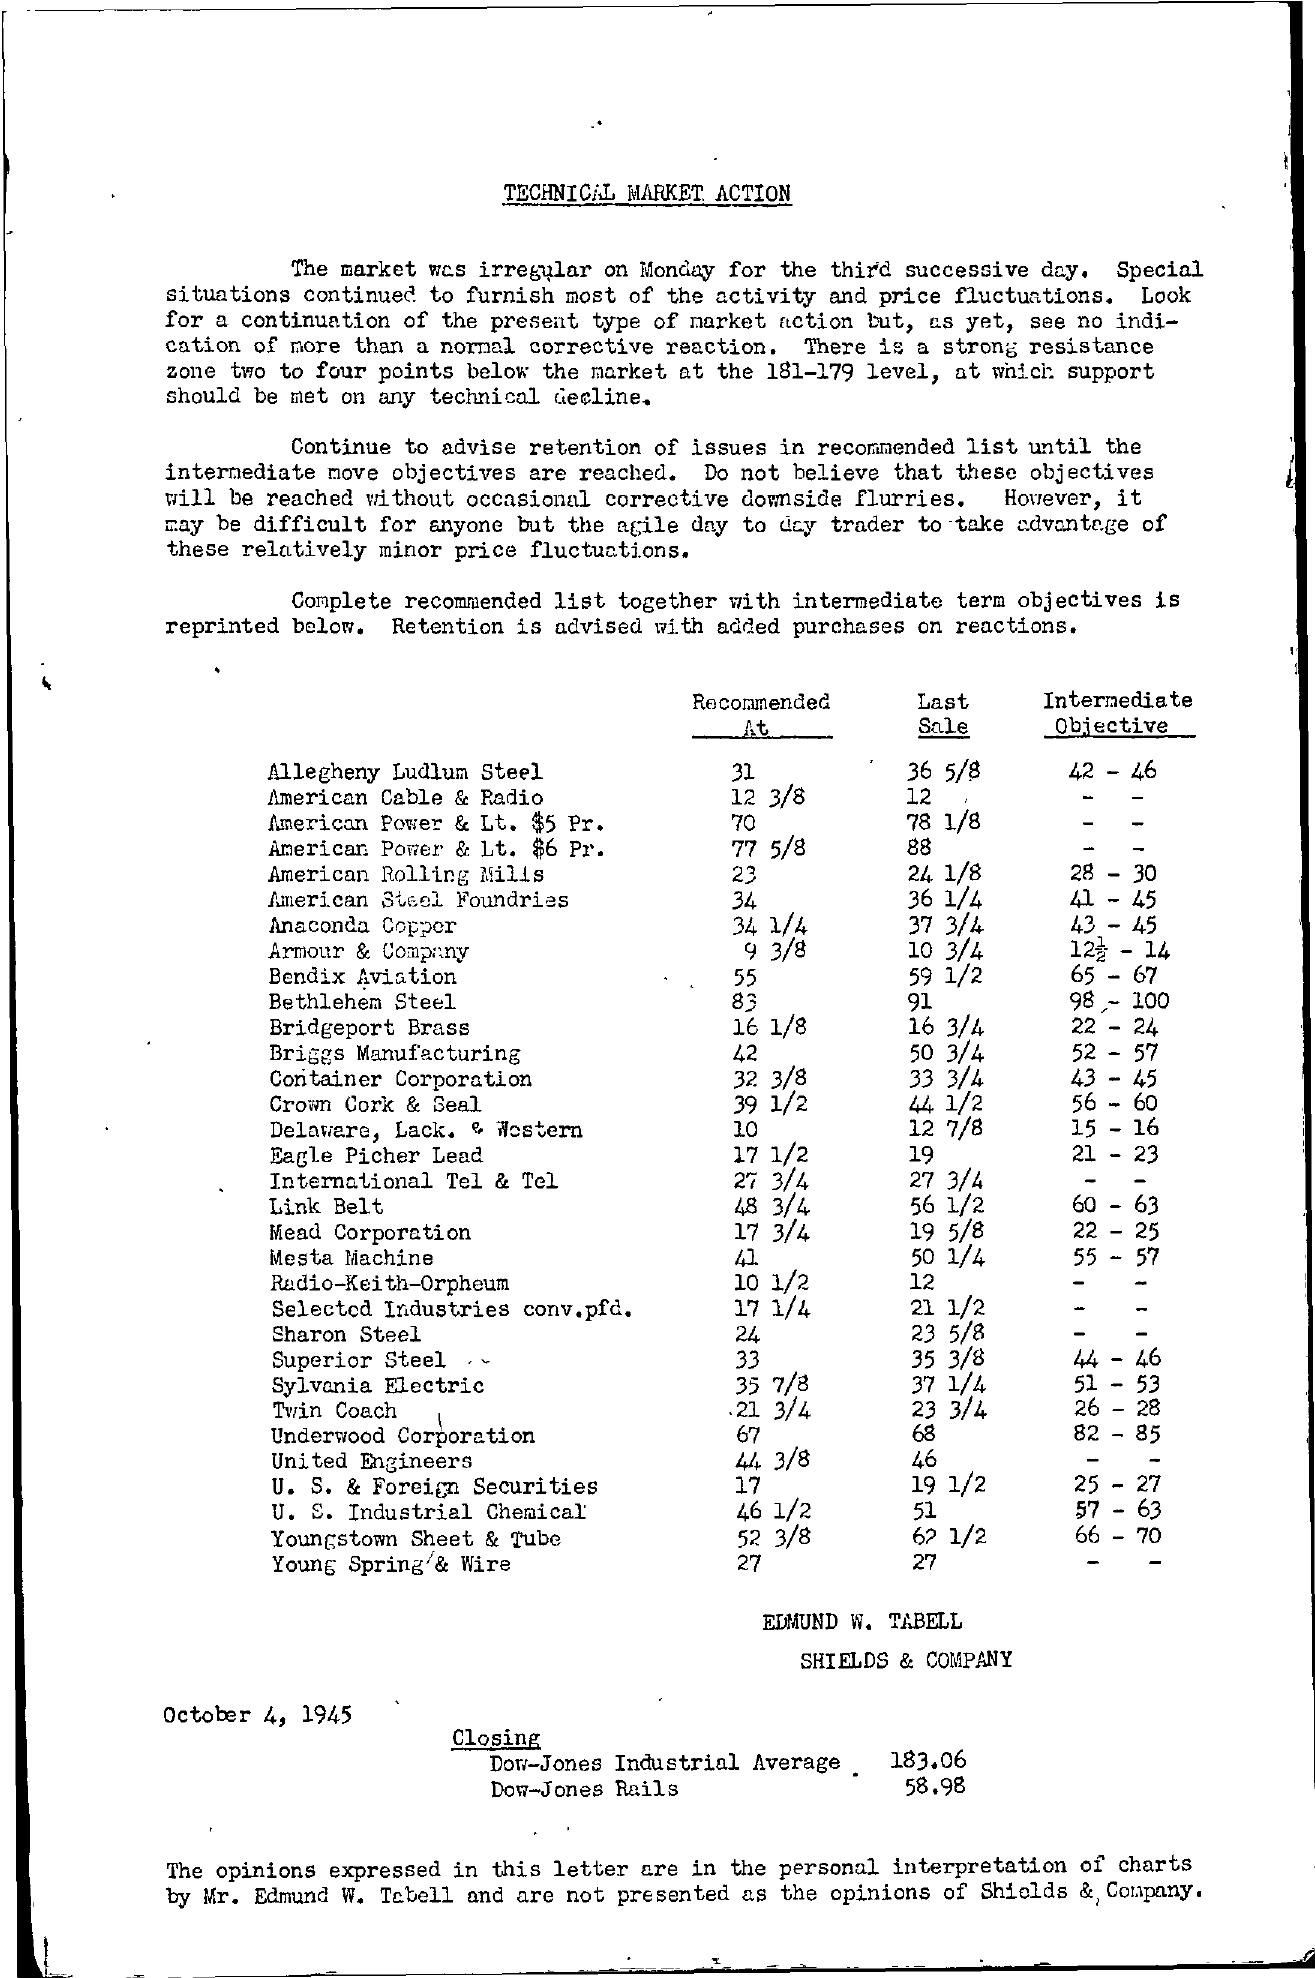 Tabell's Market Letter - October 04, 1945